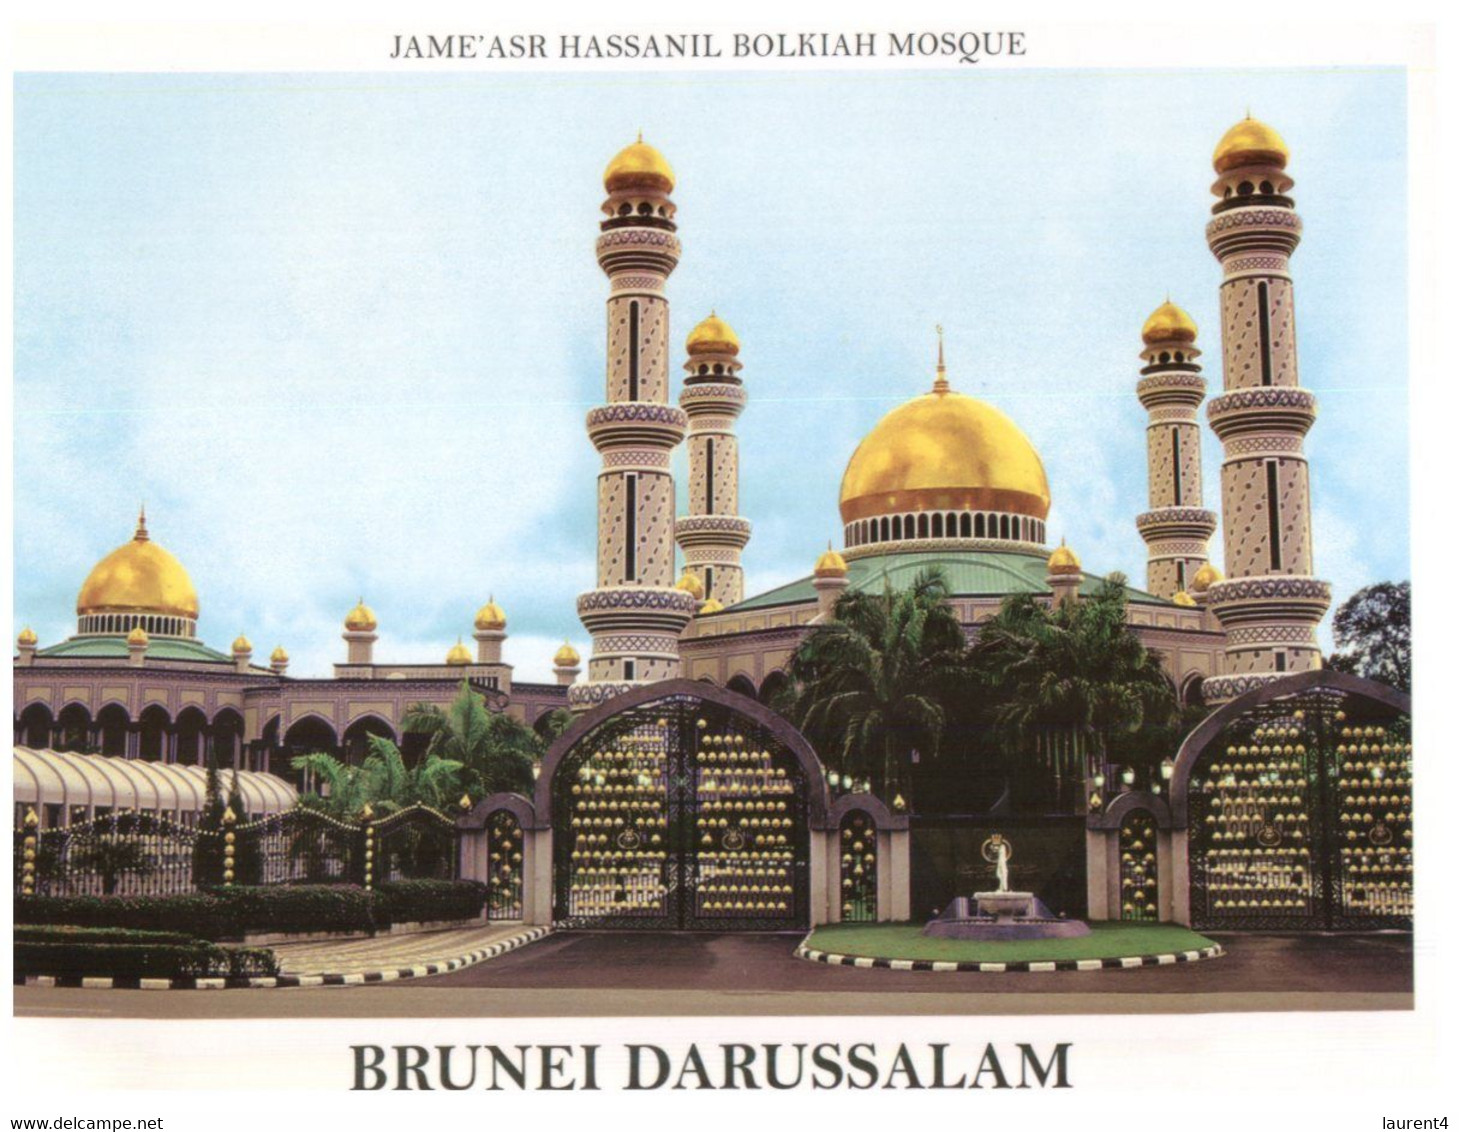 (OO 28) Brunei  Darussasalam - Jam'ash Hassanil Bolkiah Mosque - Brunei